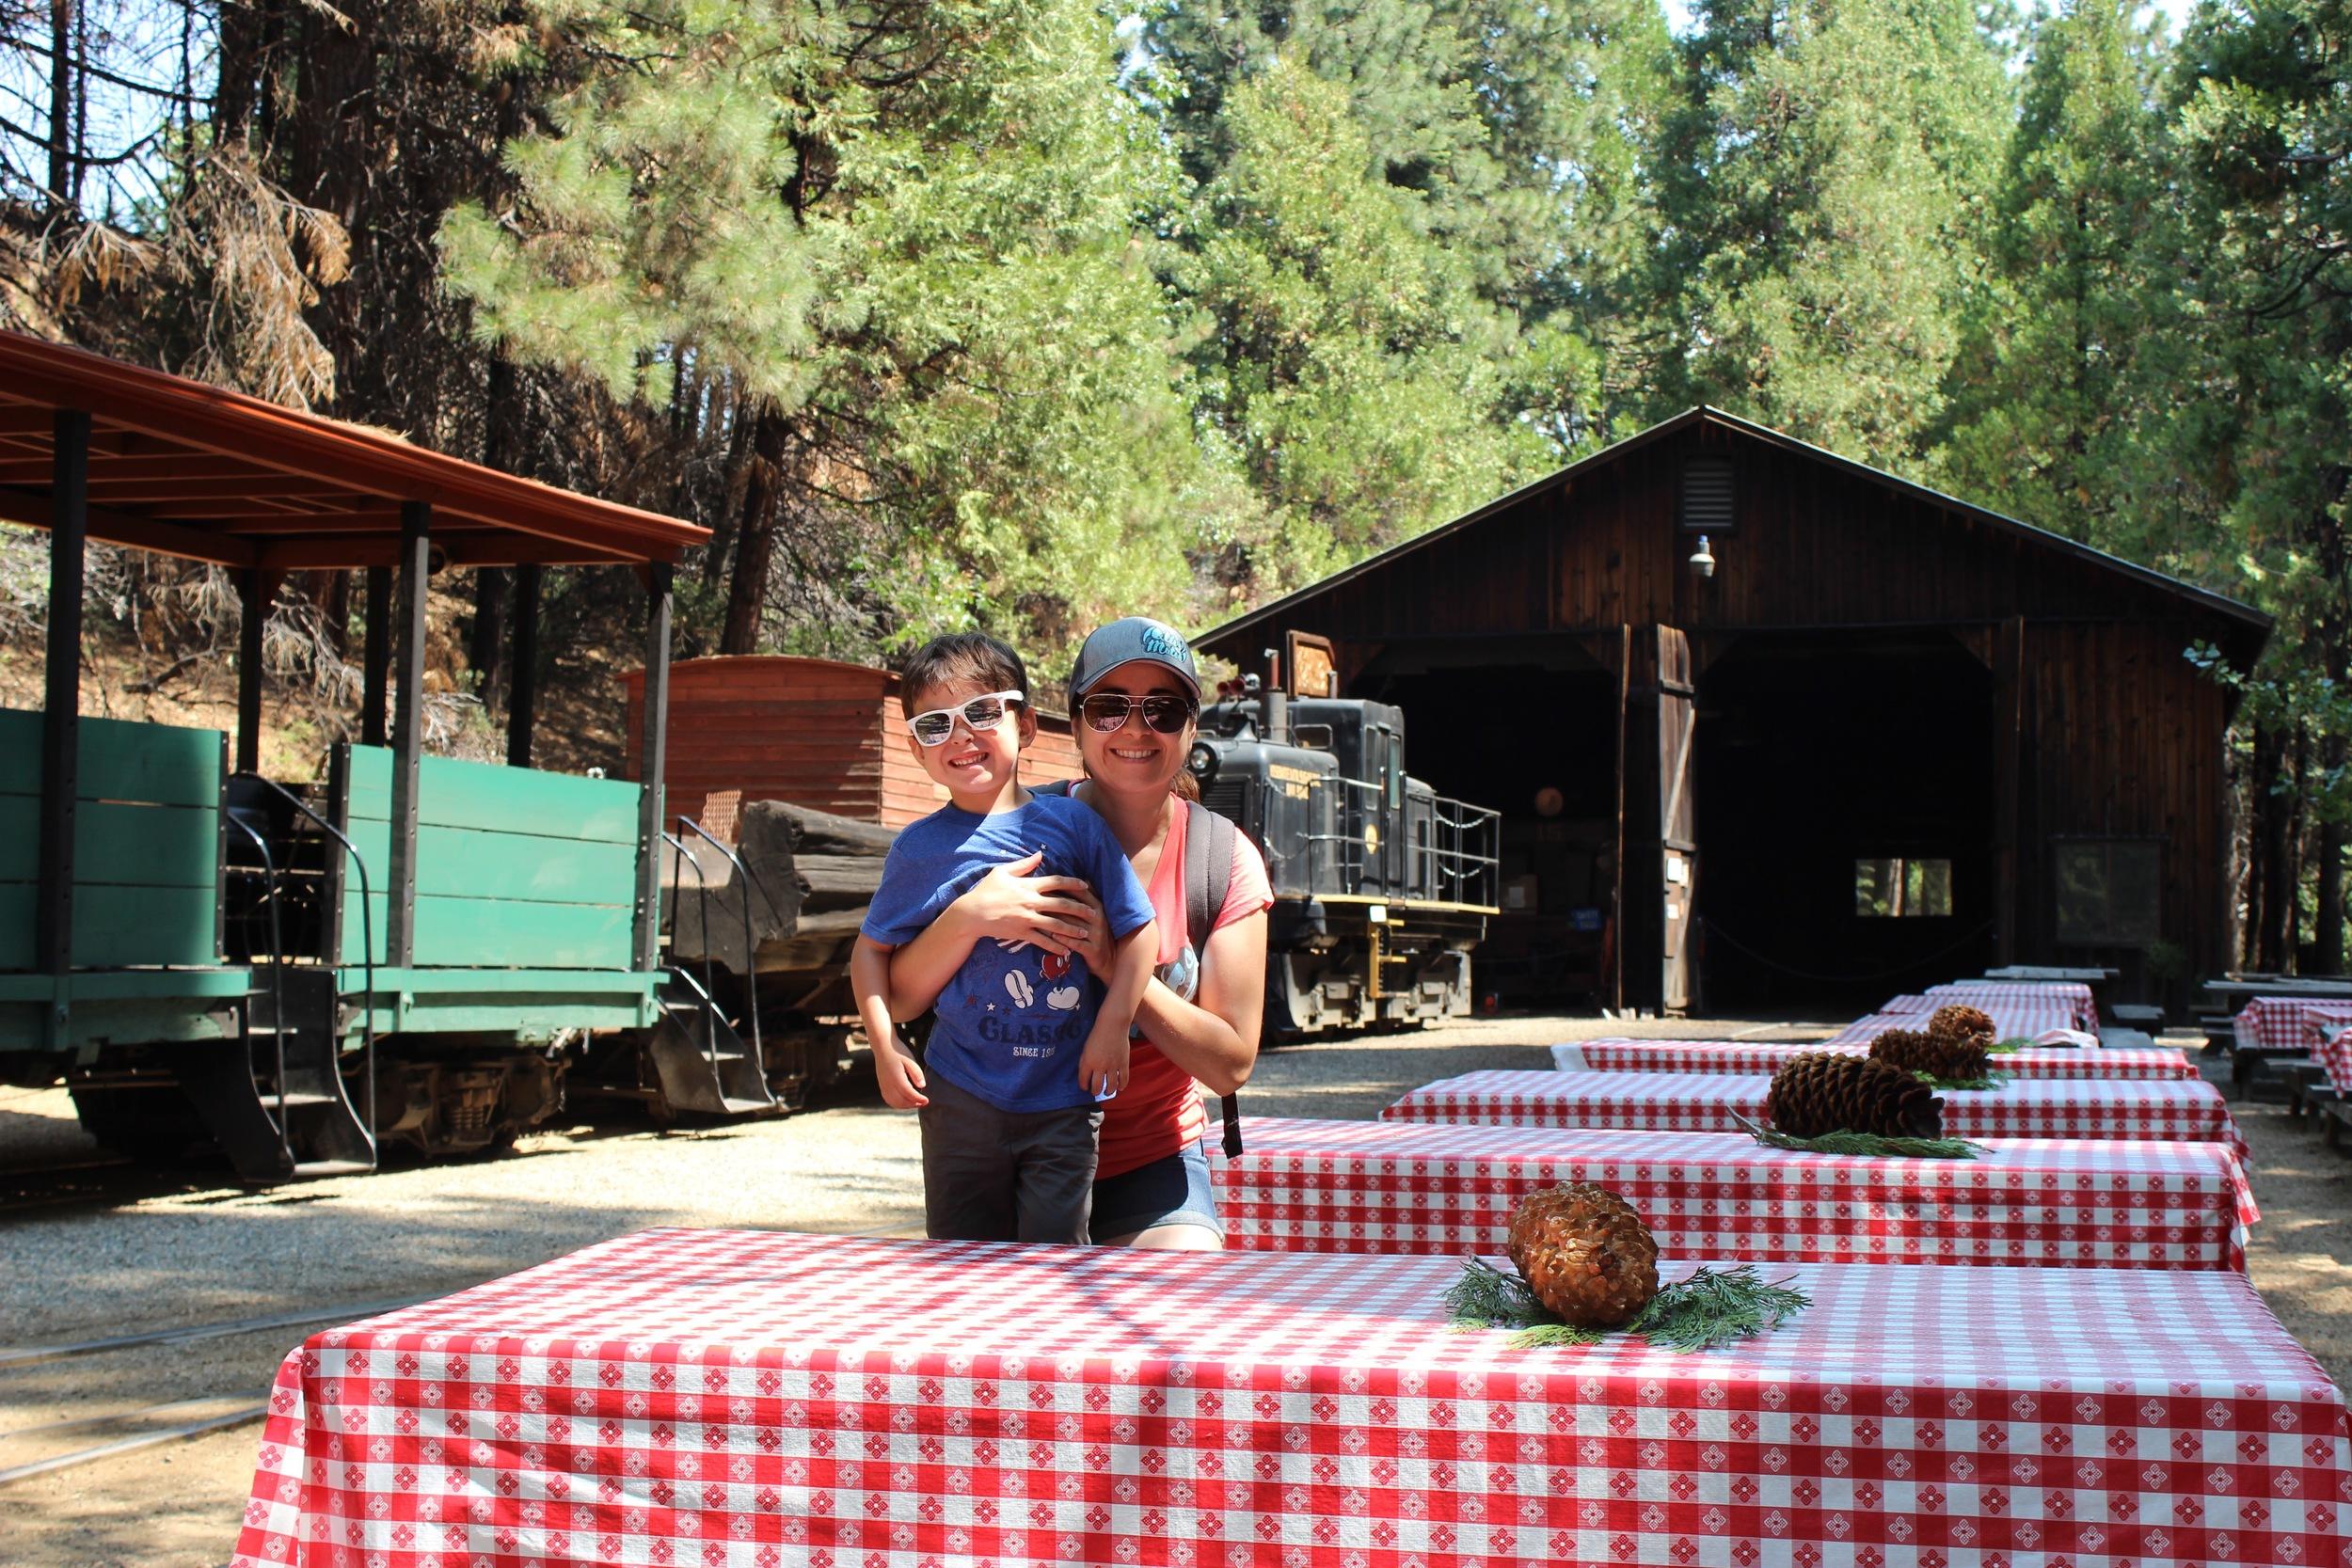 Coarsegold_Ca_KOA_Camping August_201563.jpg